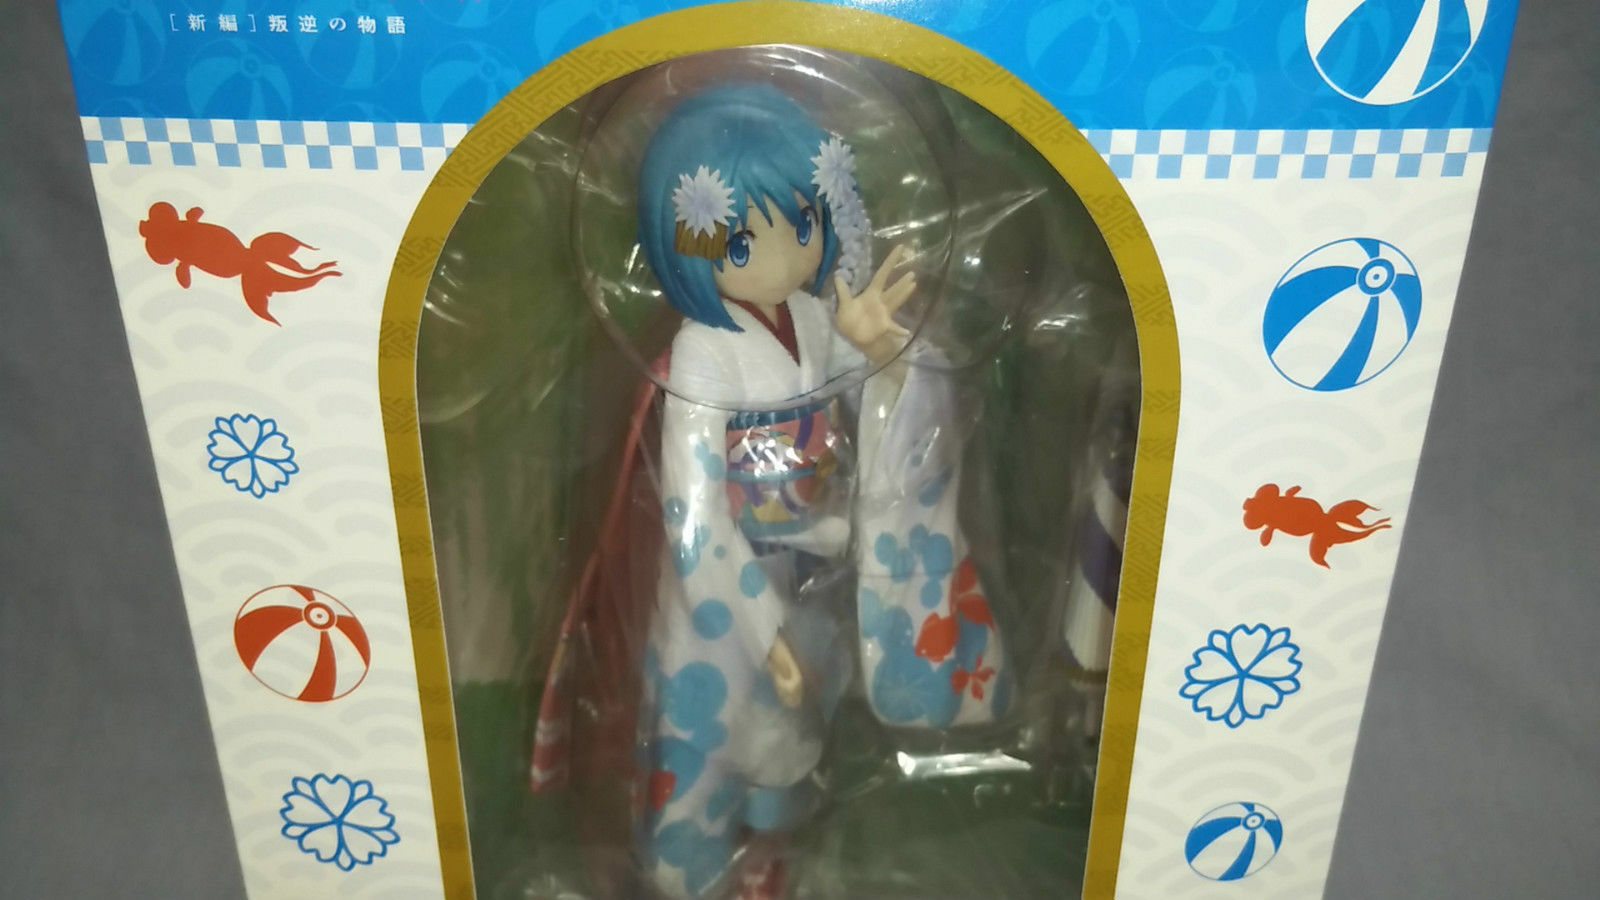 Puella Magi Madoka Magica Miki Sayaka Sayaka Sayaka Maiko version Aniplex exclusive USA New 118c58